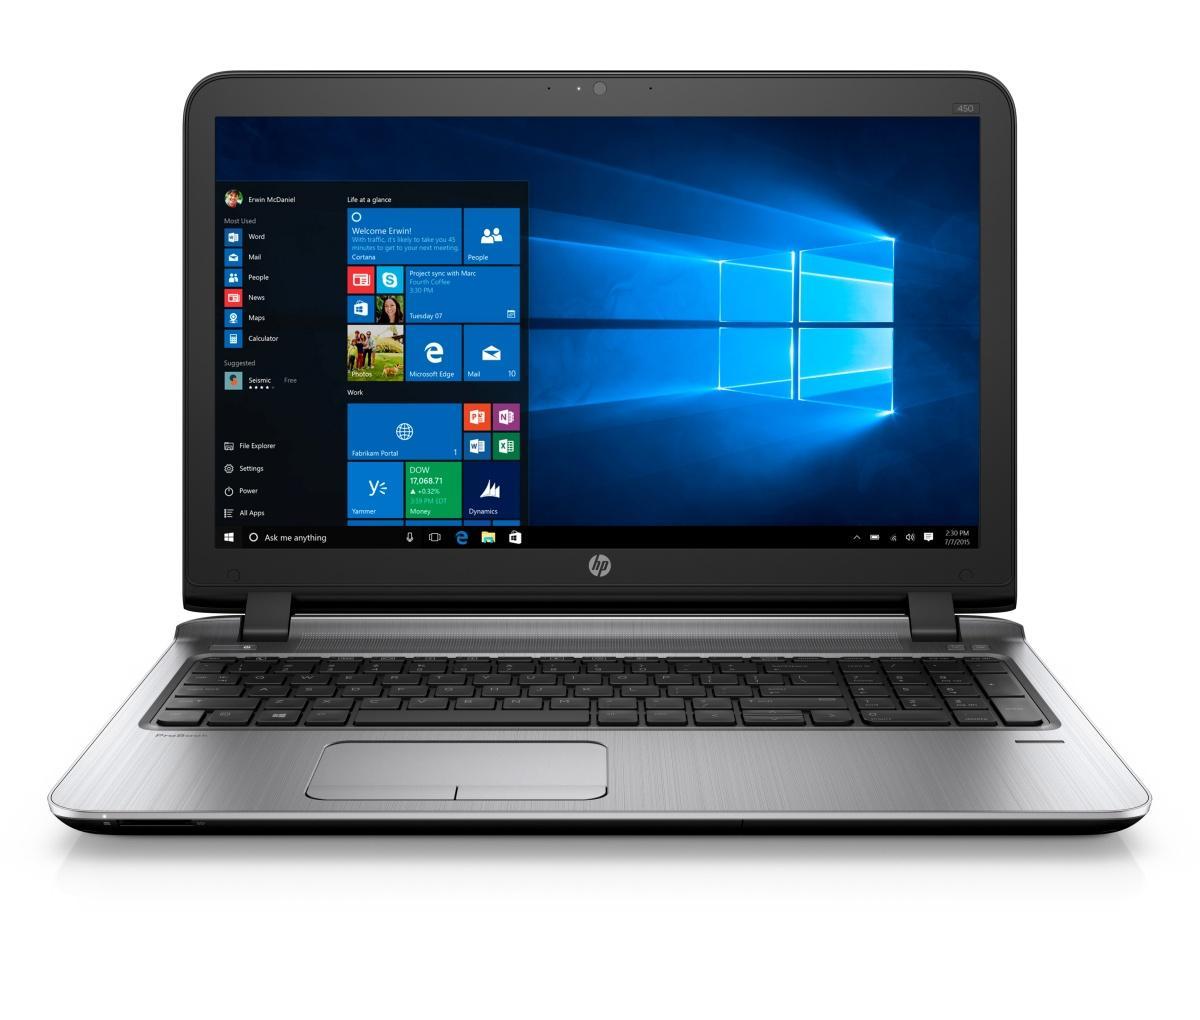 HP ProBook 450 G3 W4P20ES